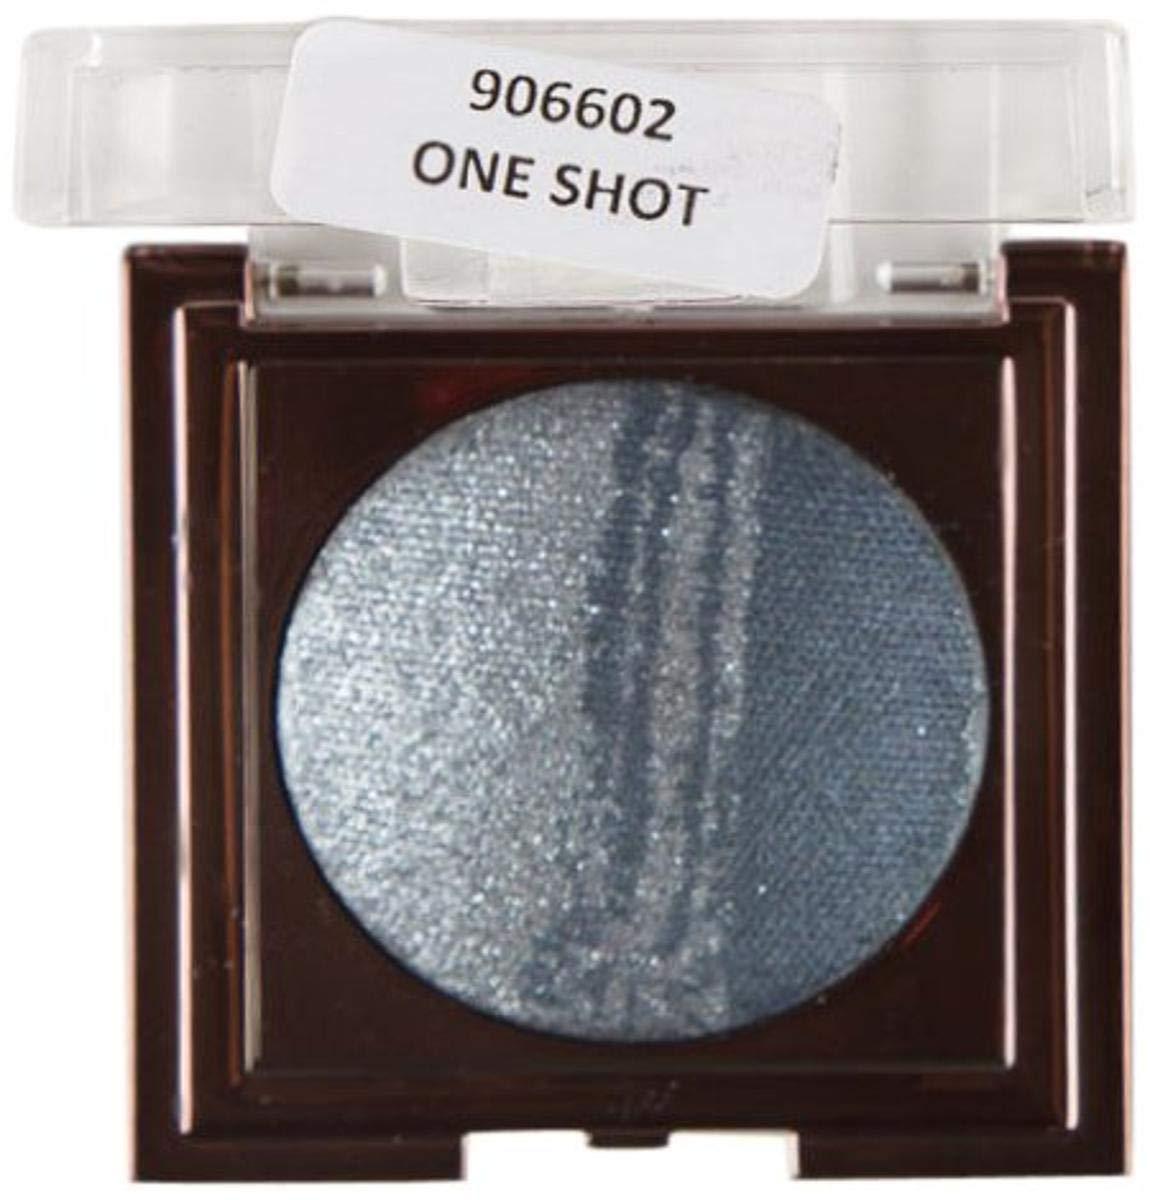 freshMinerals Intense Baked EyeShadow, One Shot Intense, 2.5 Gram